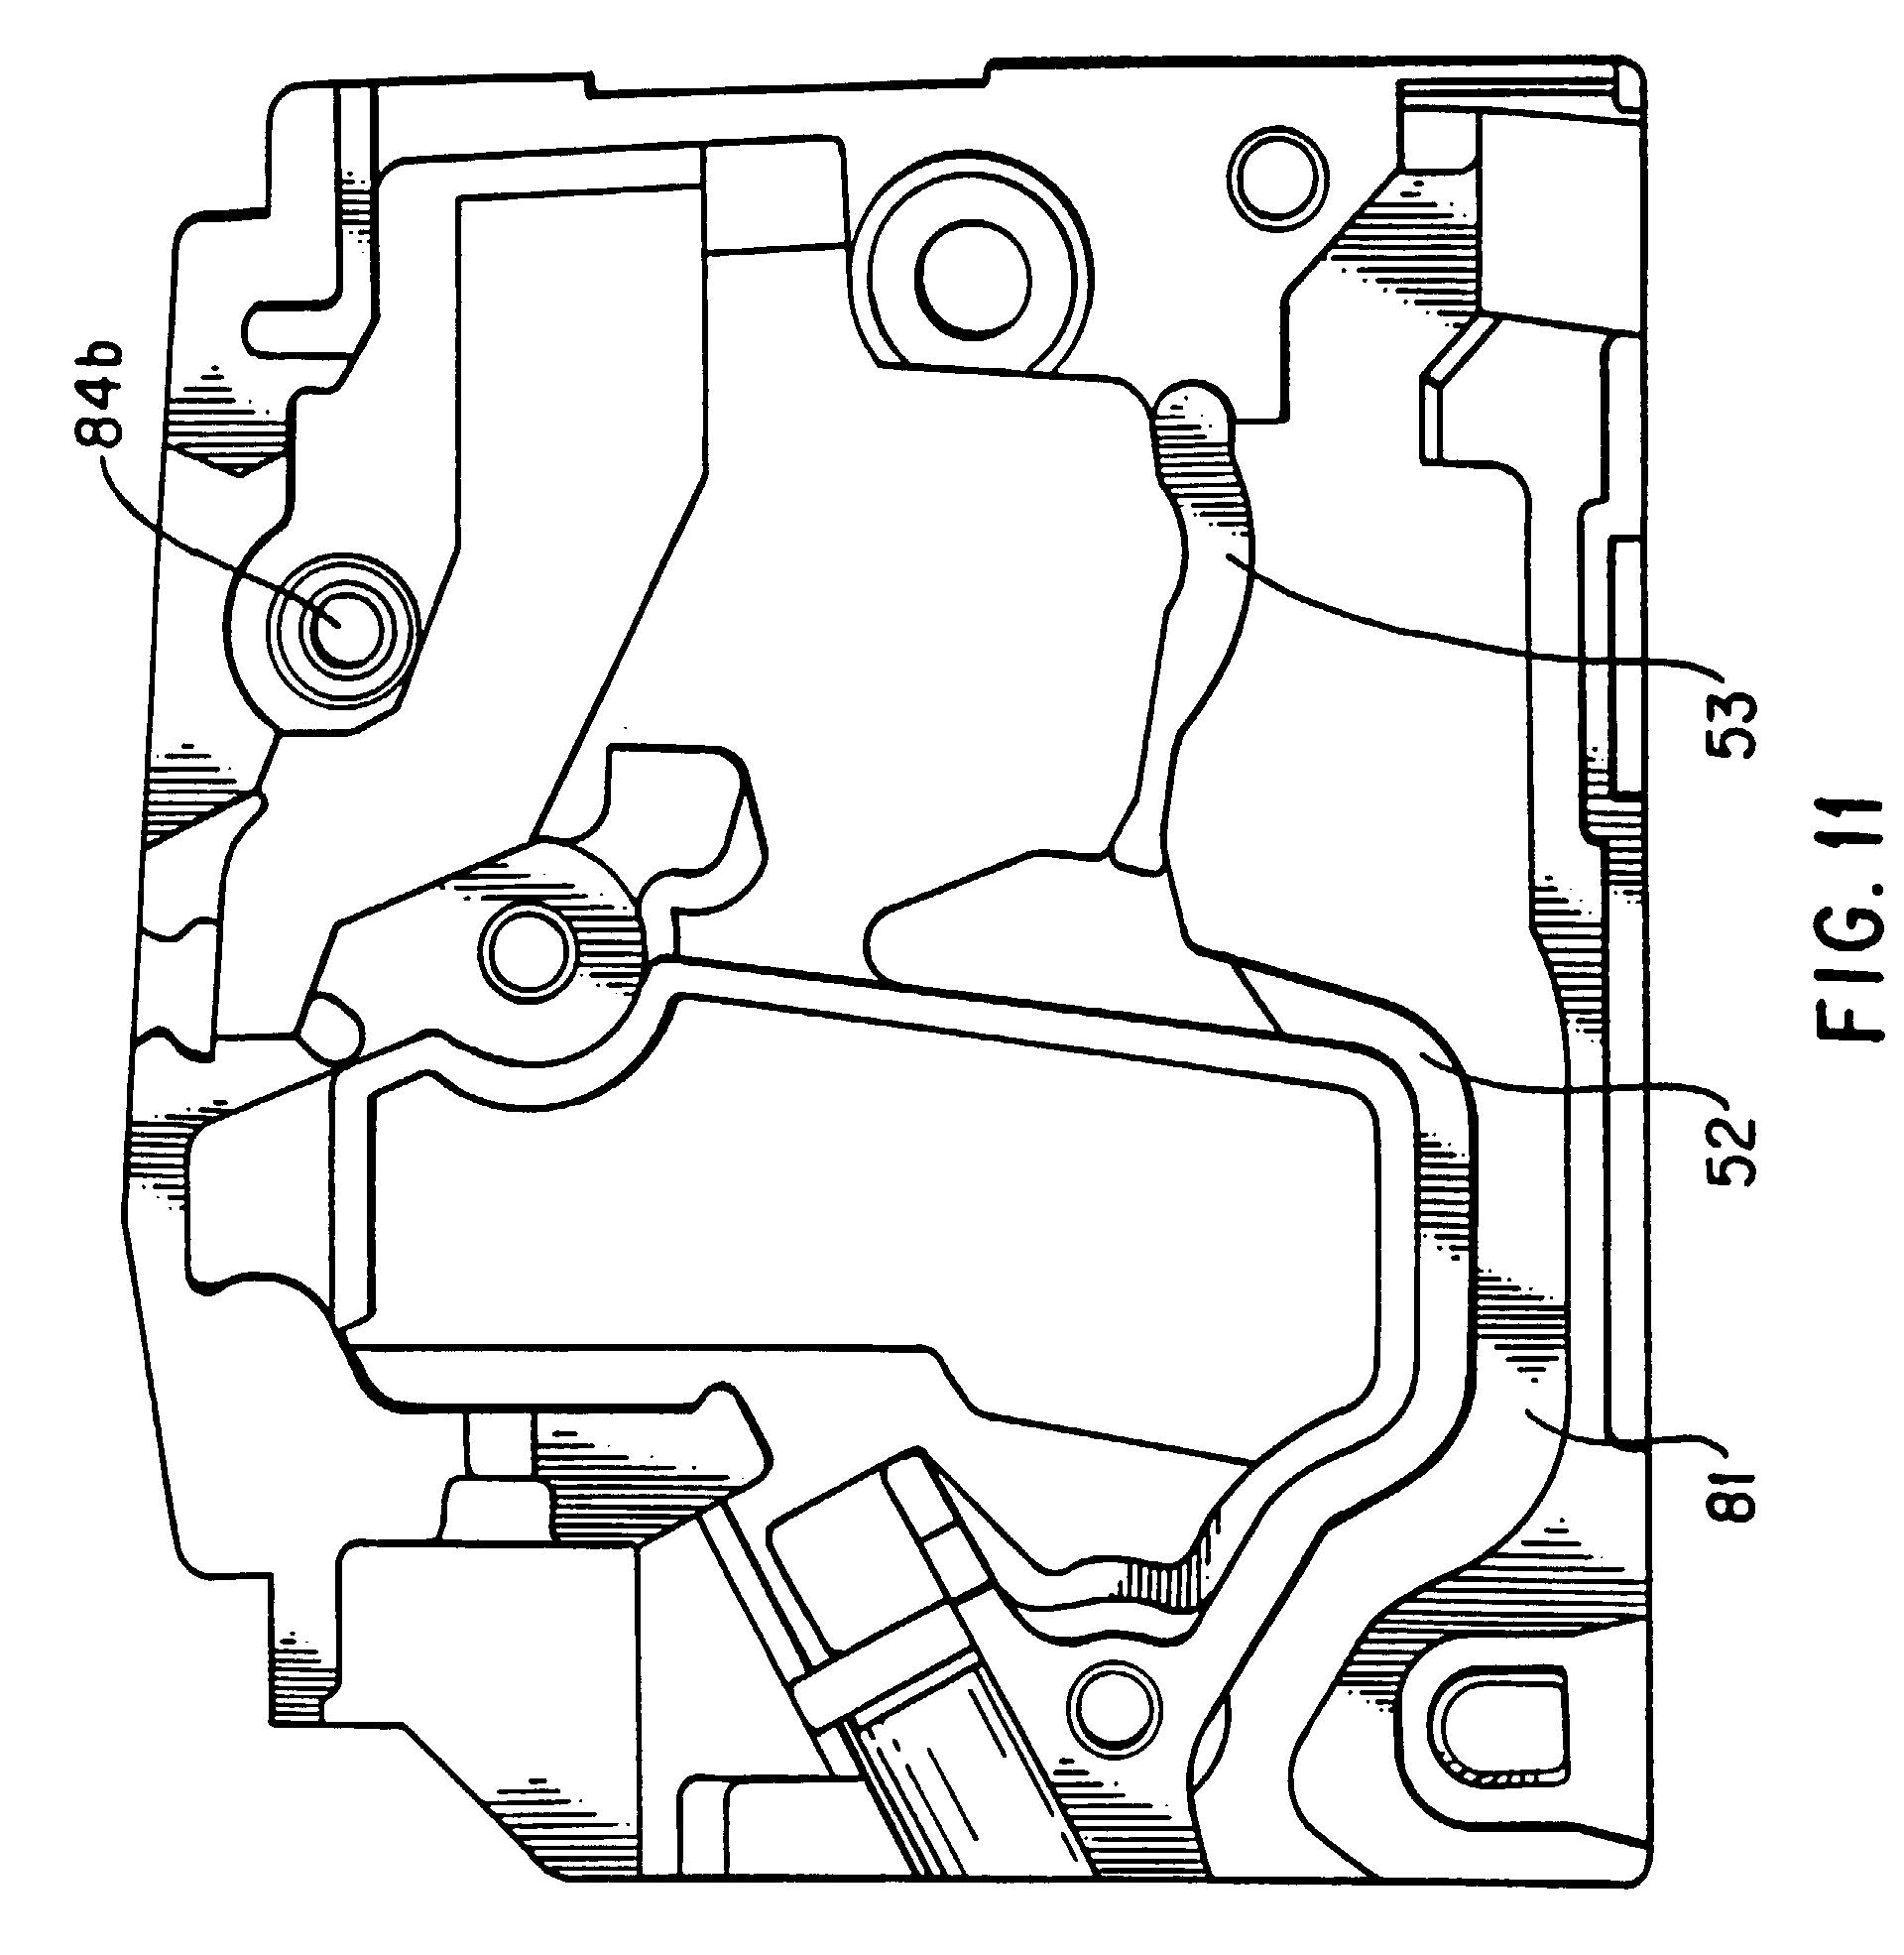 patent ep0603346b1